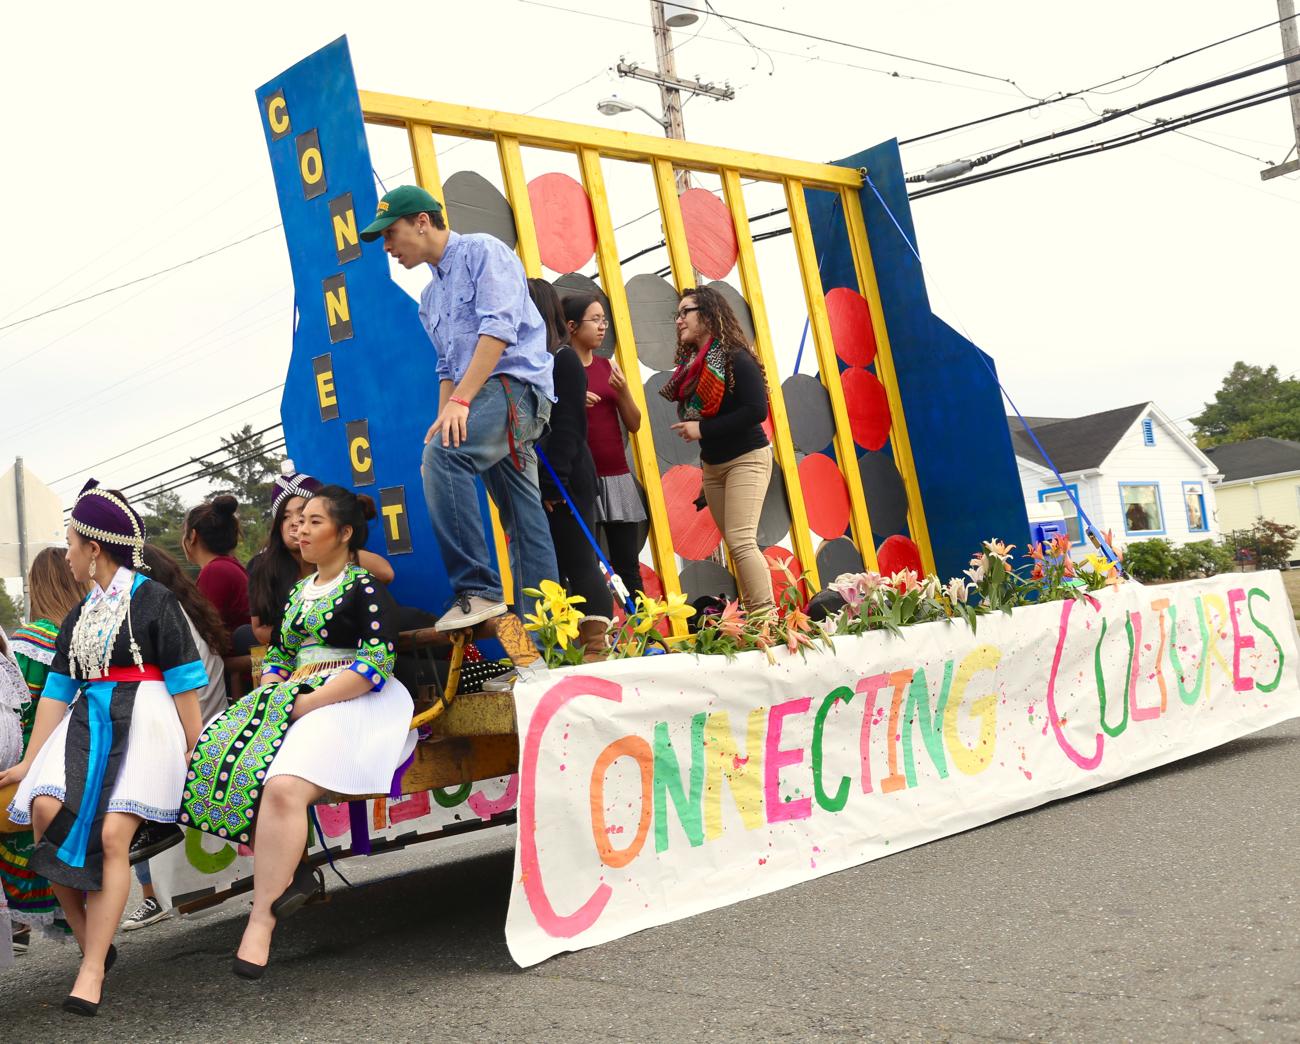 (PHOTOS) This Year's Eureka High Homecoming Parade Theme ...